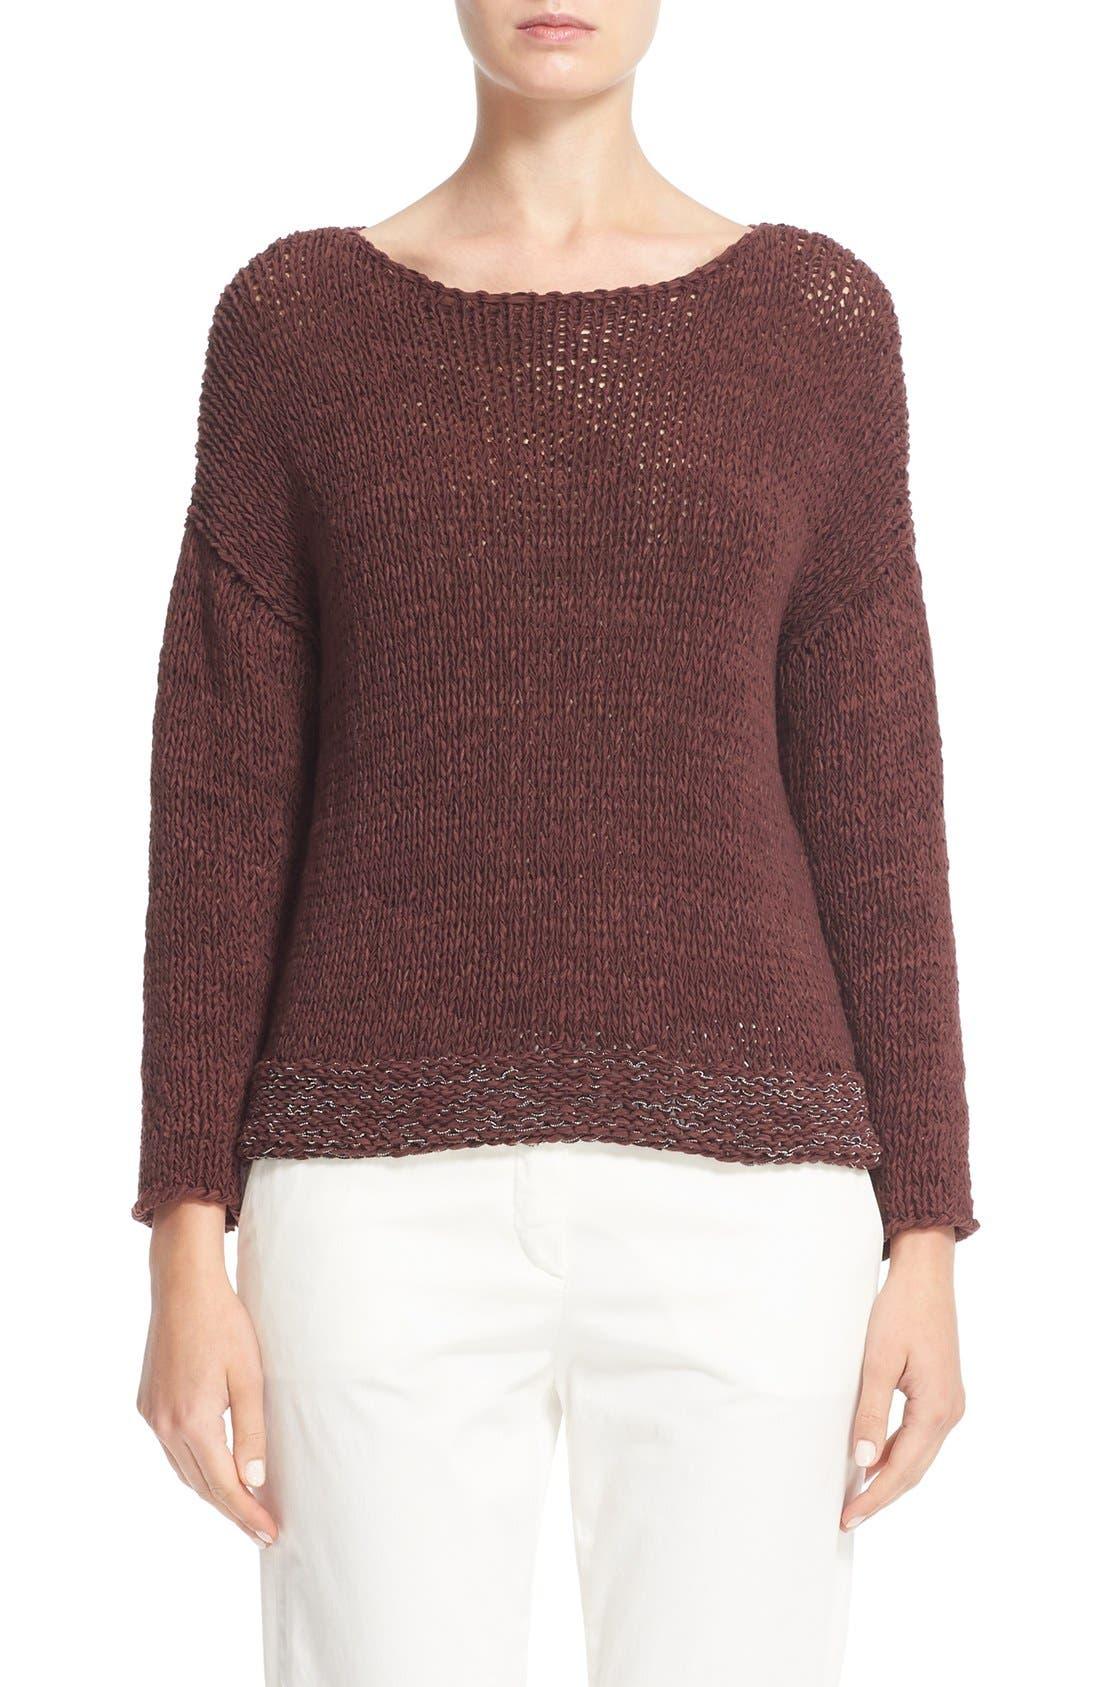 Fabiana Filippi Mollini Trim Cotton Blend Sweater